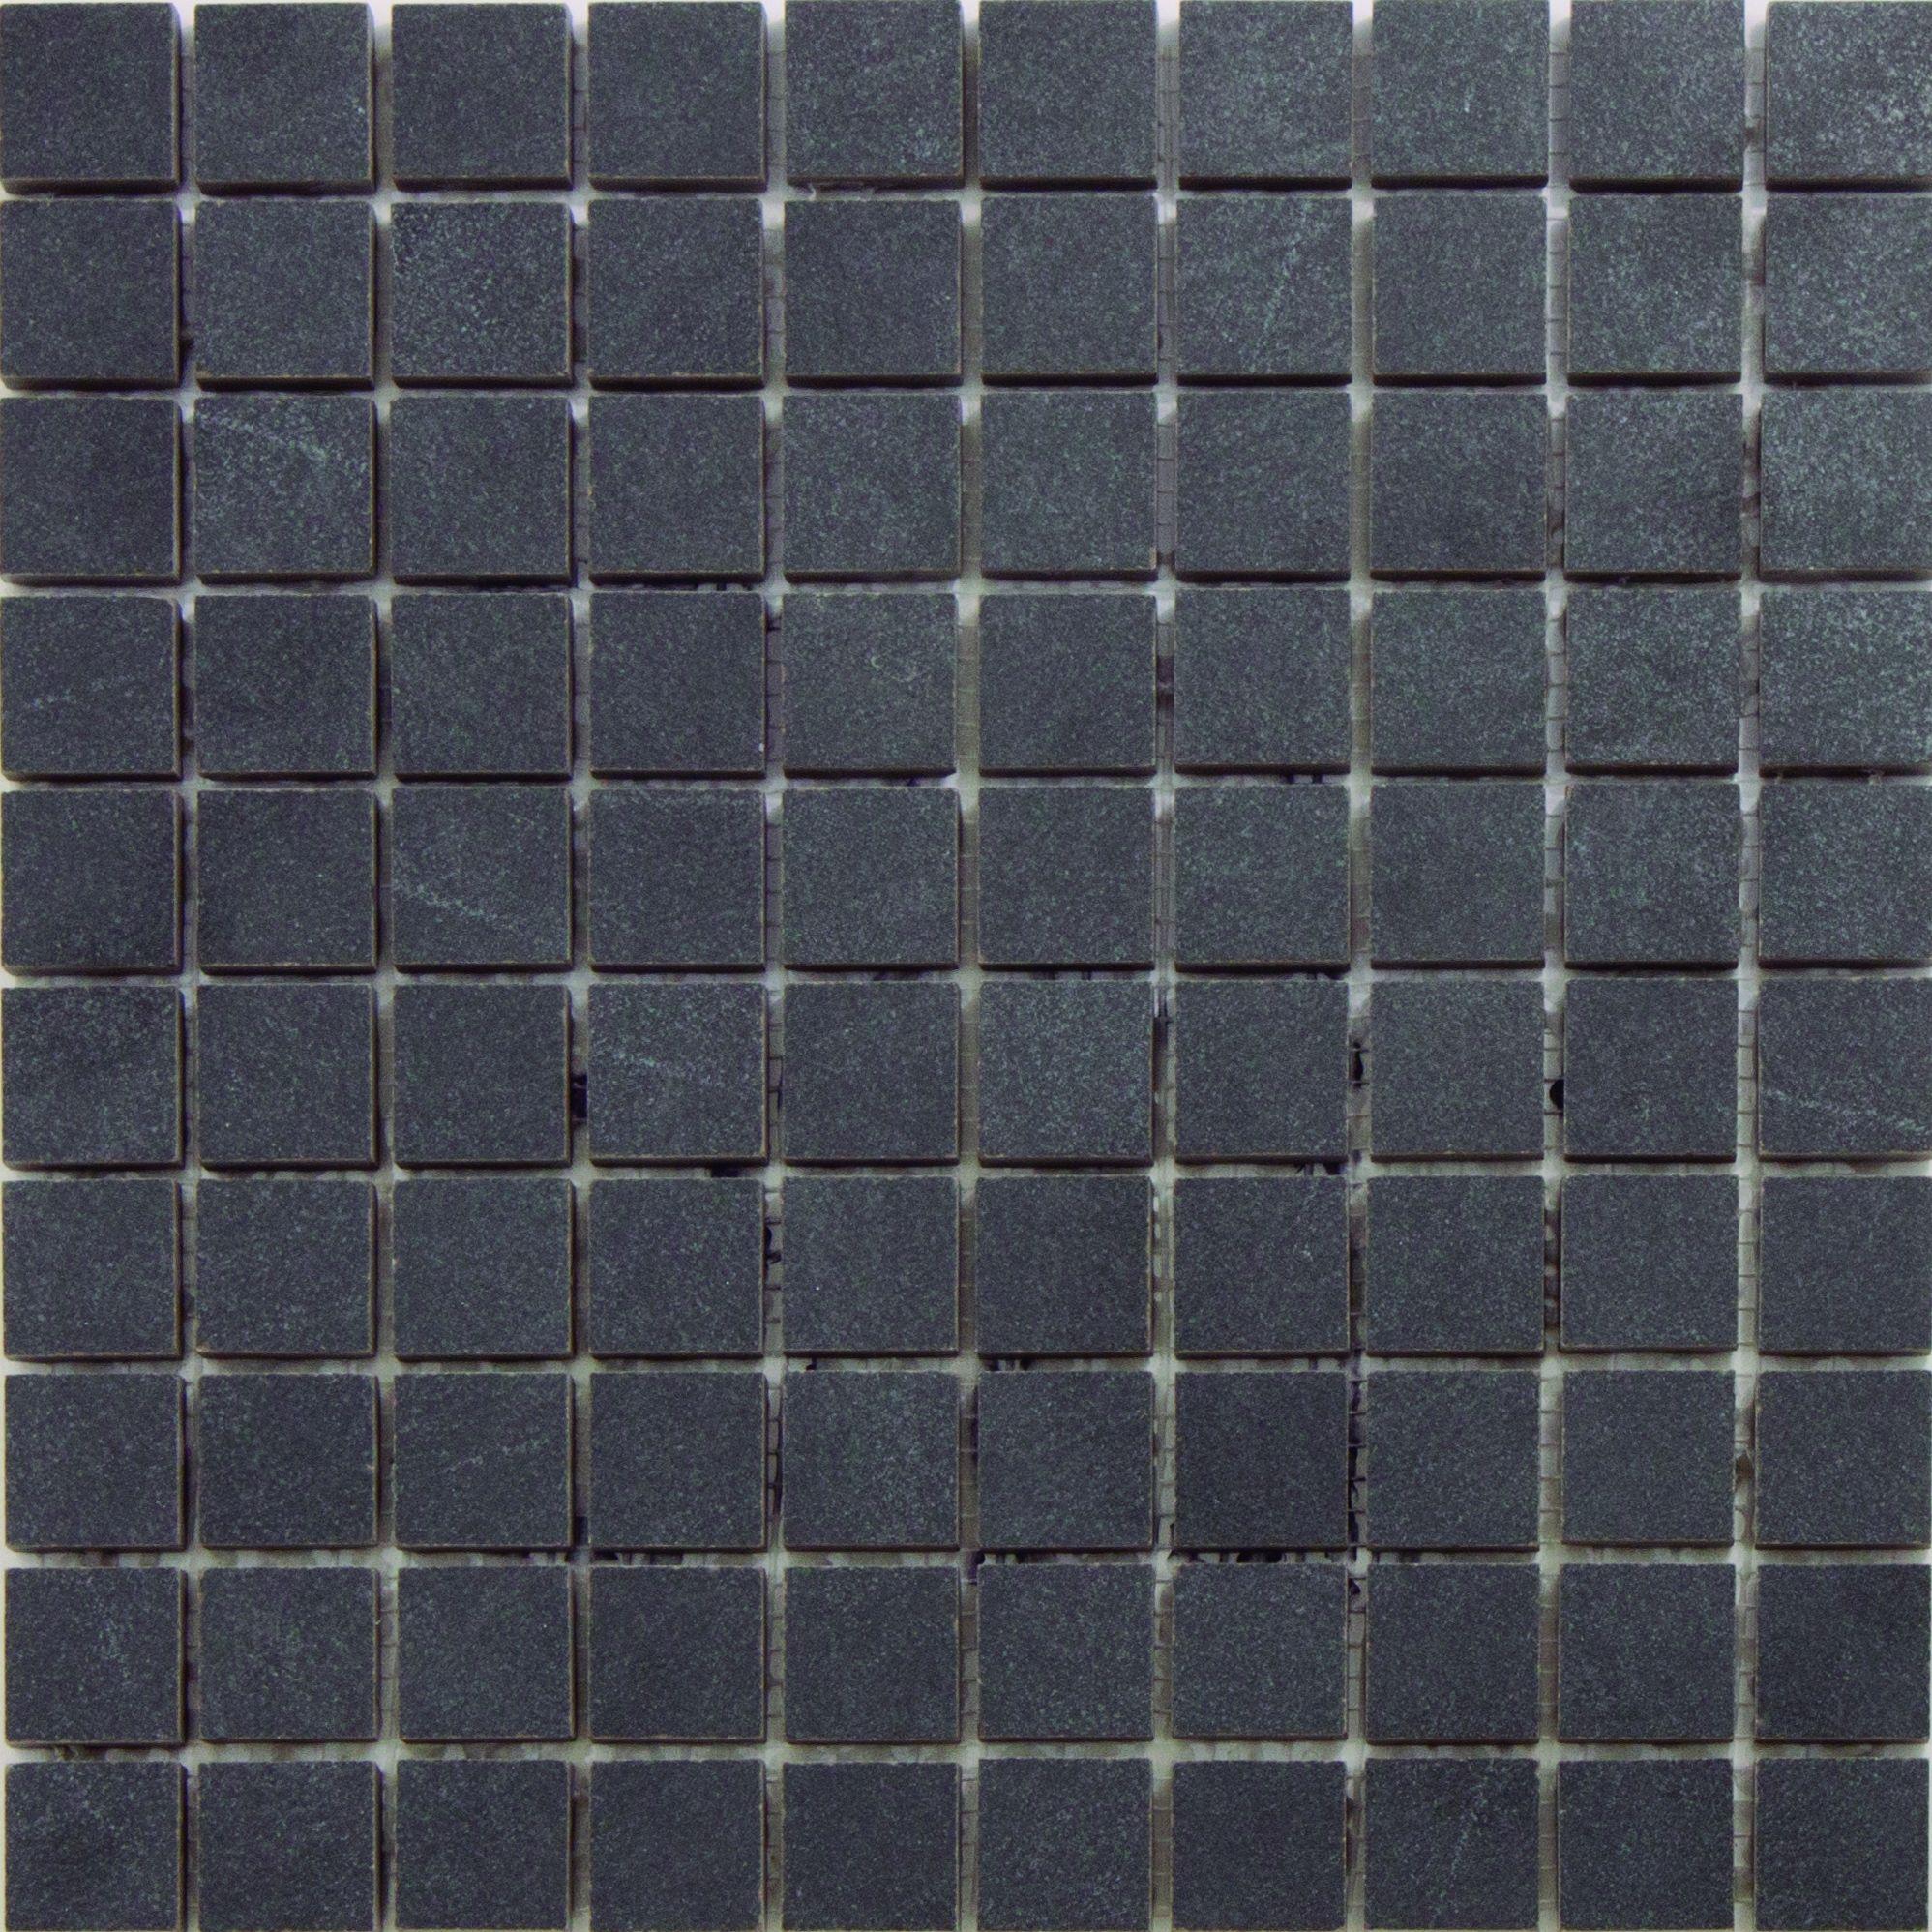 Limestone Floor Tiles Mosaic Ceramic Atala Tile And Sanitary Berlin